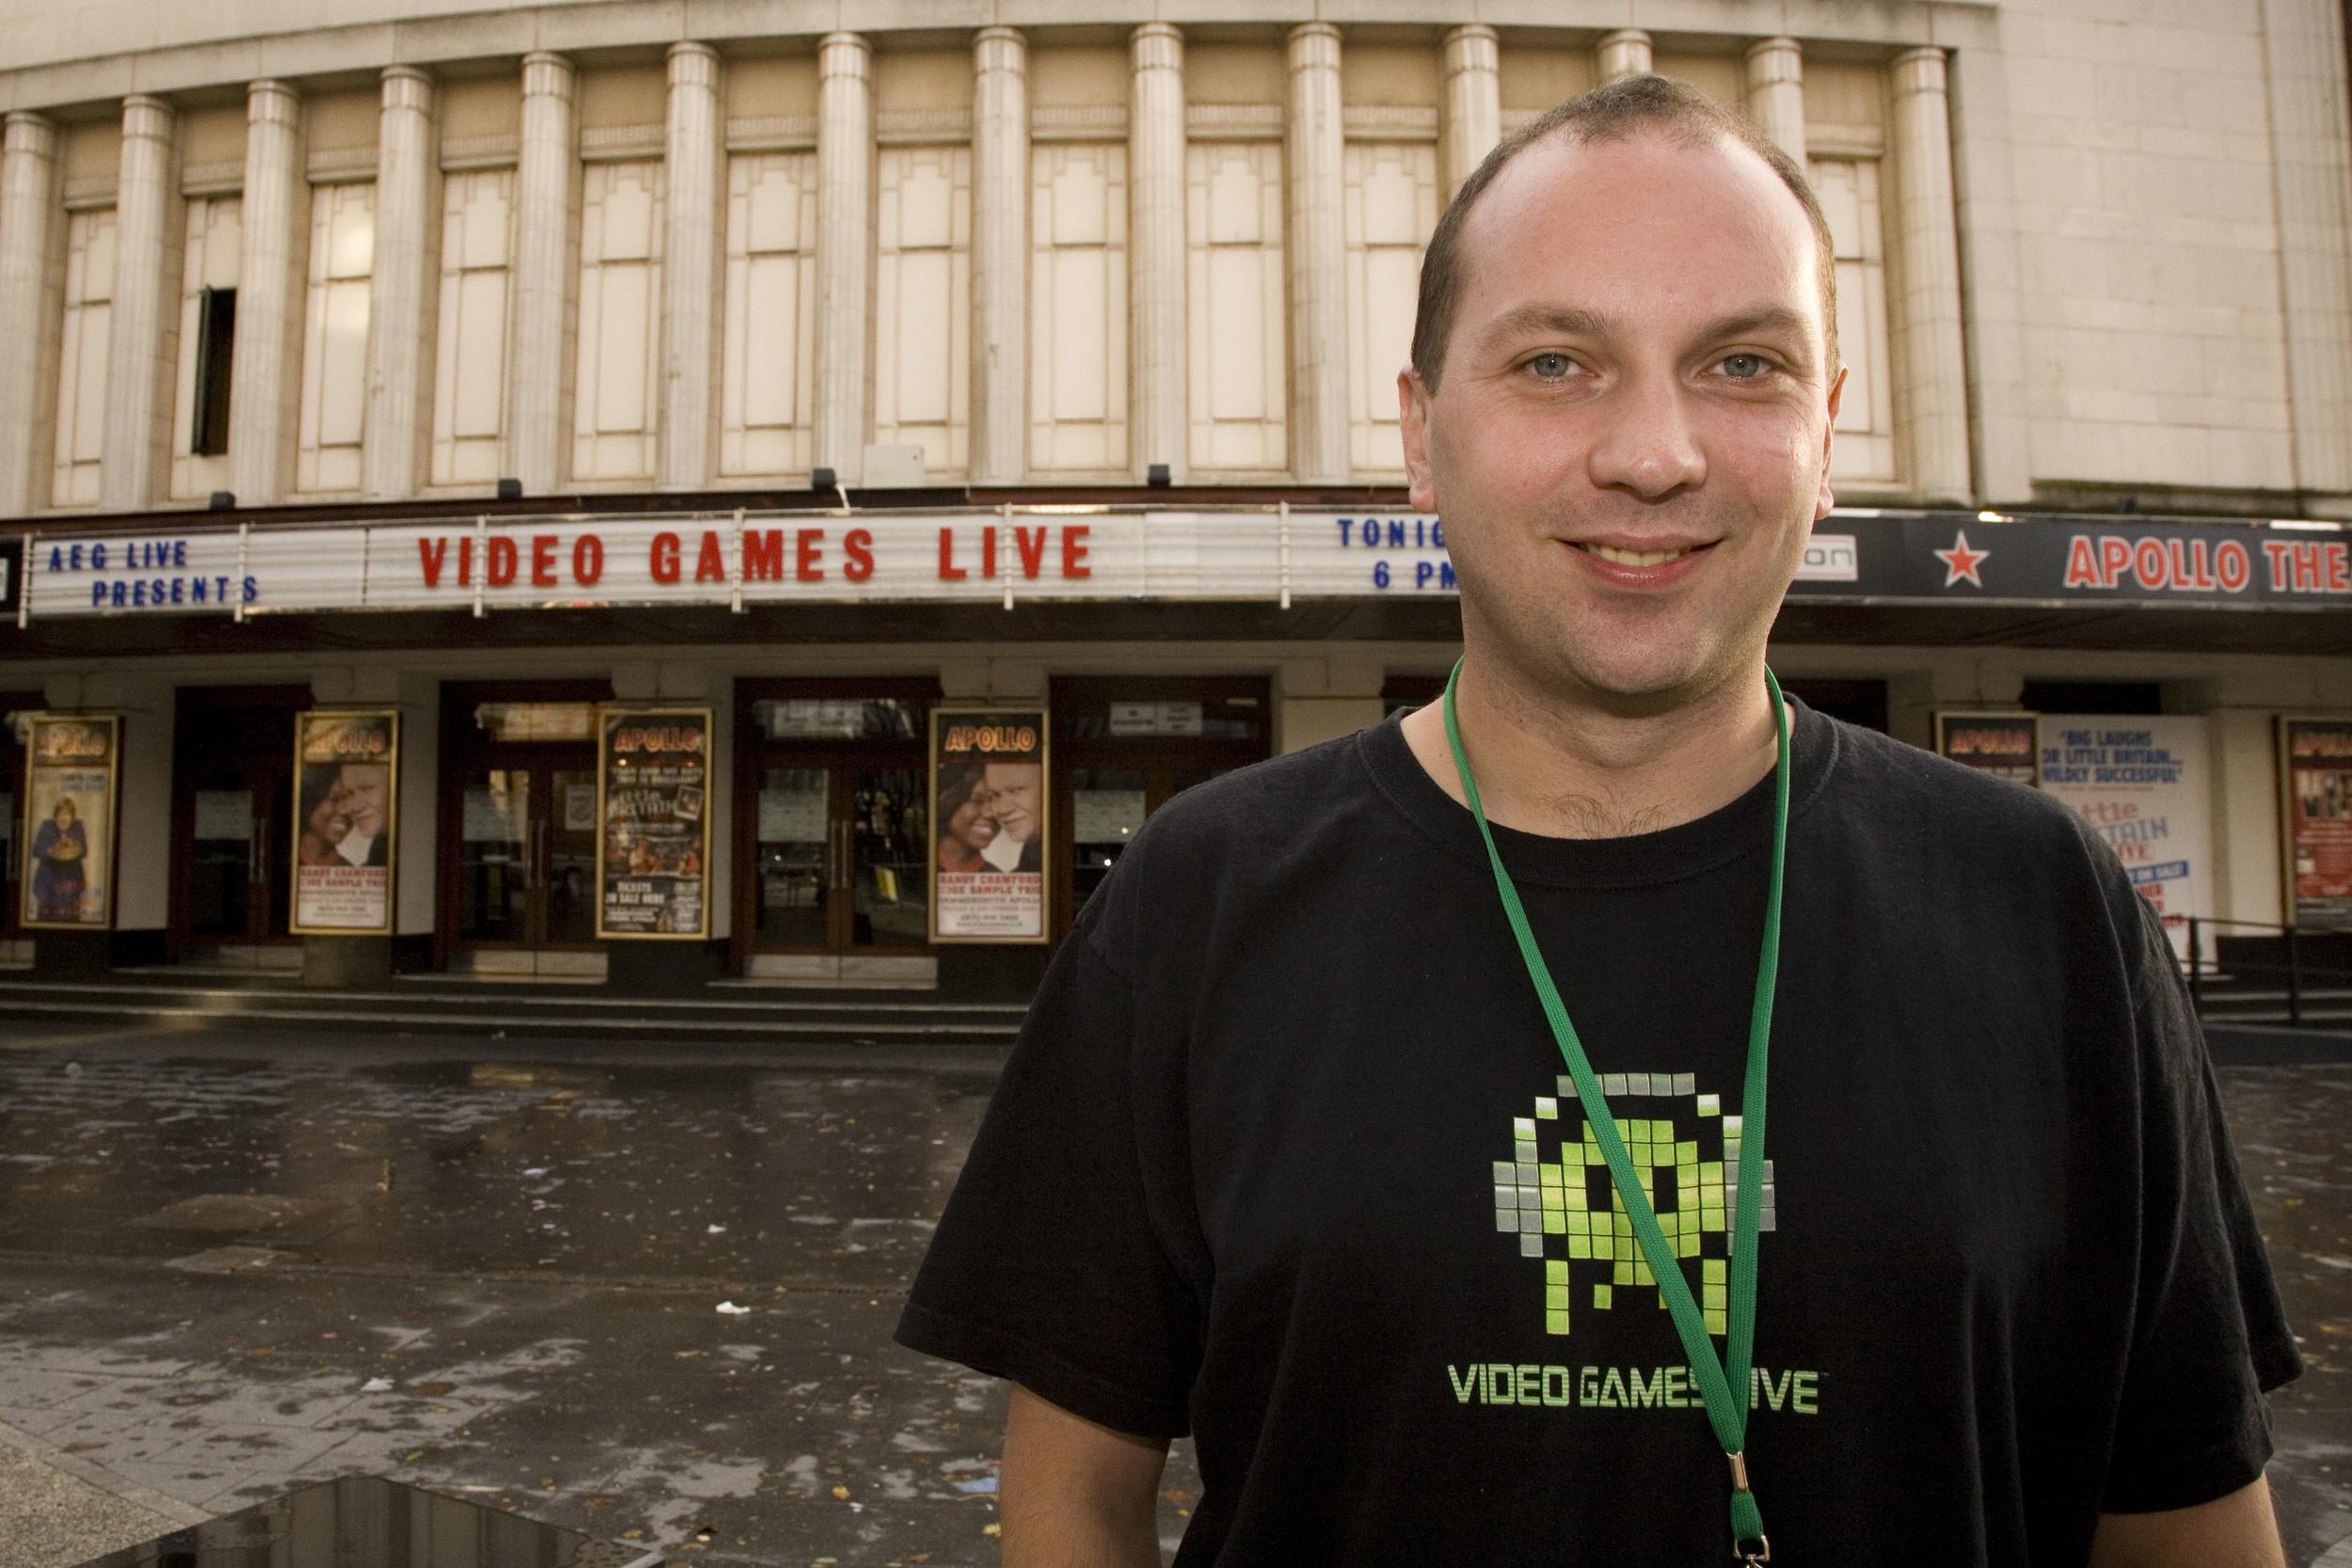 videogameslive_02.jpg